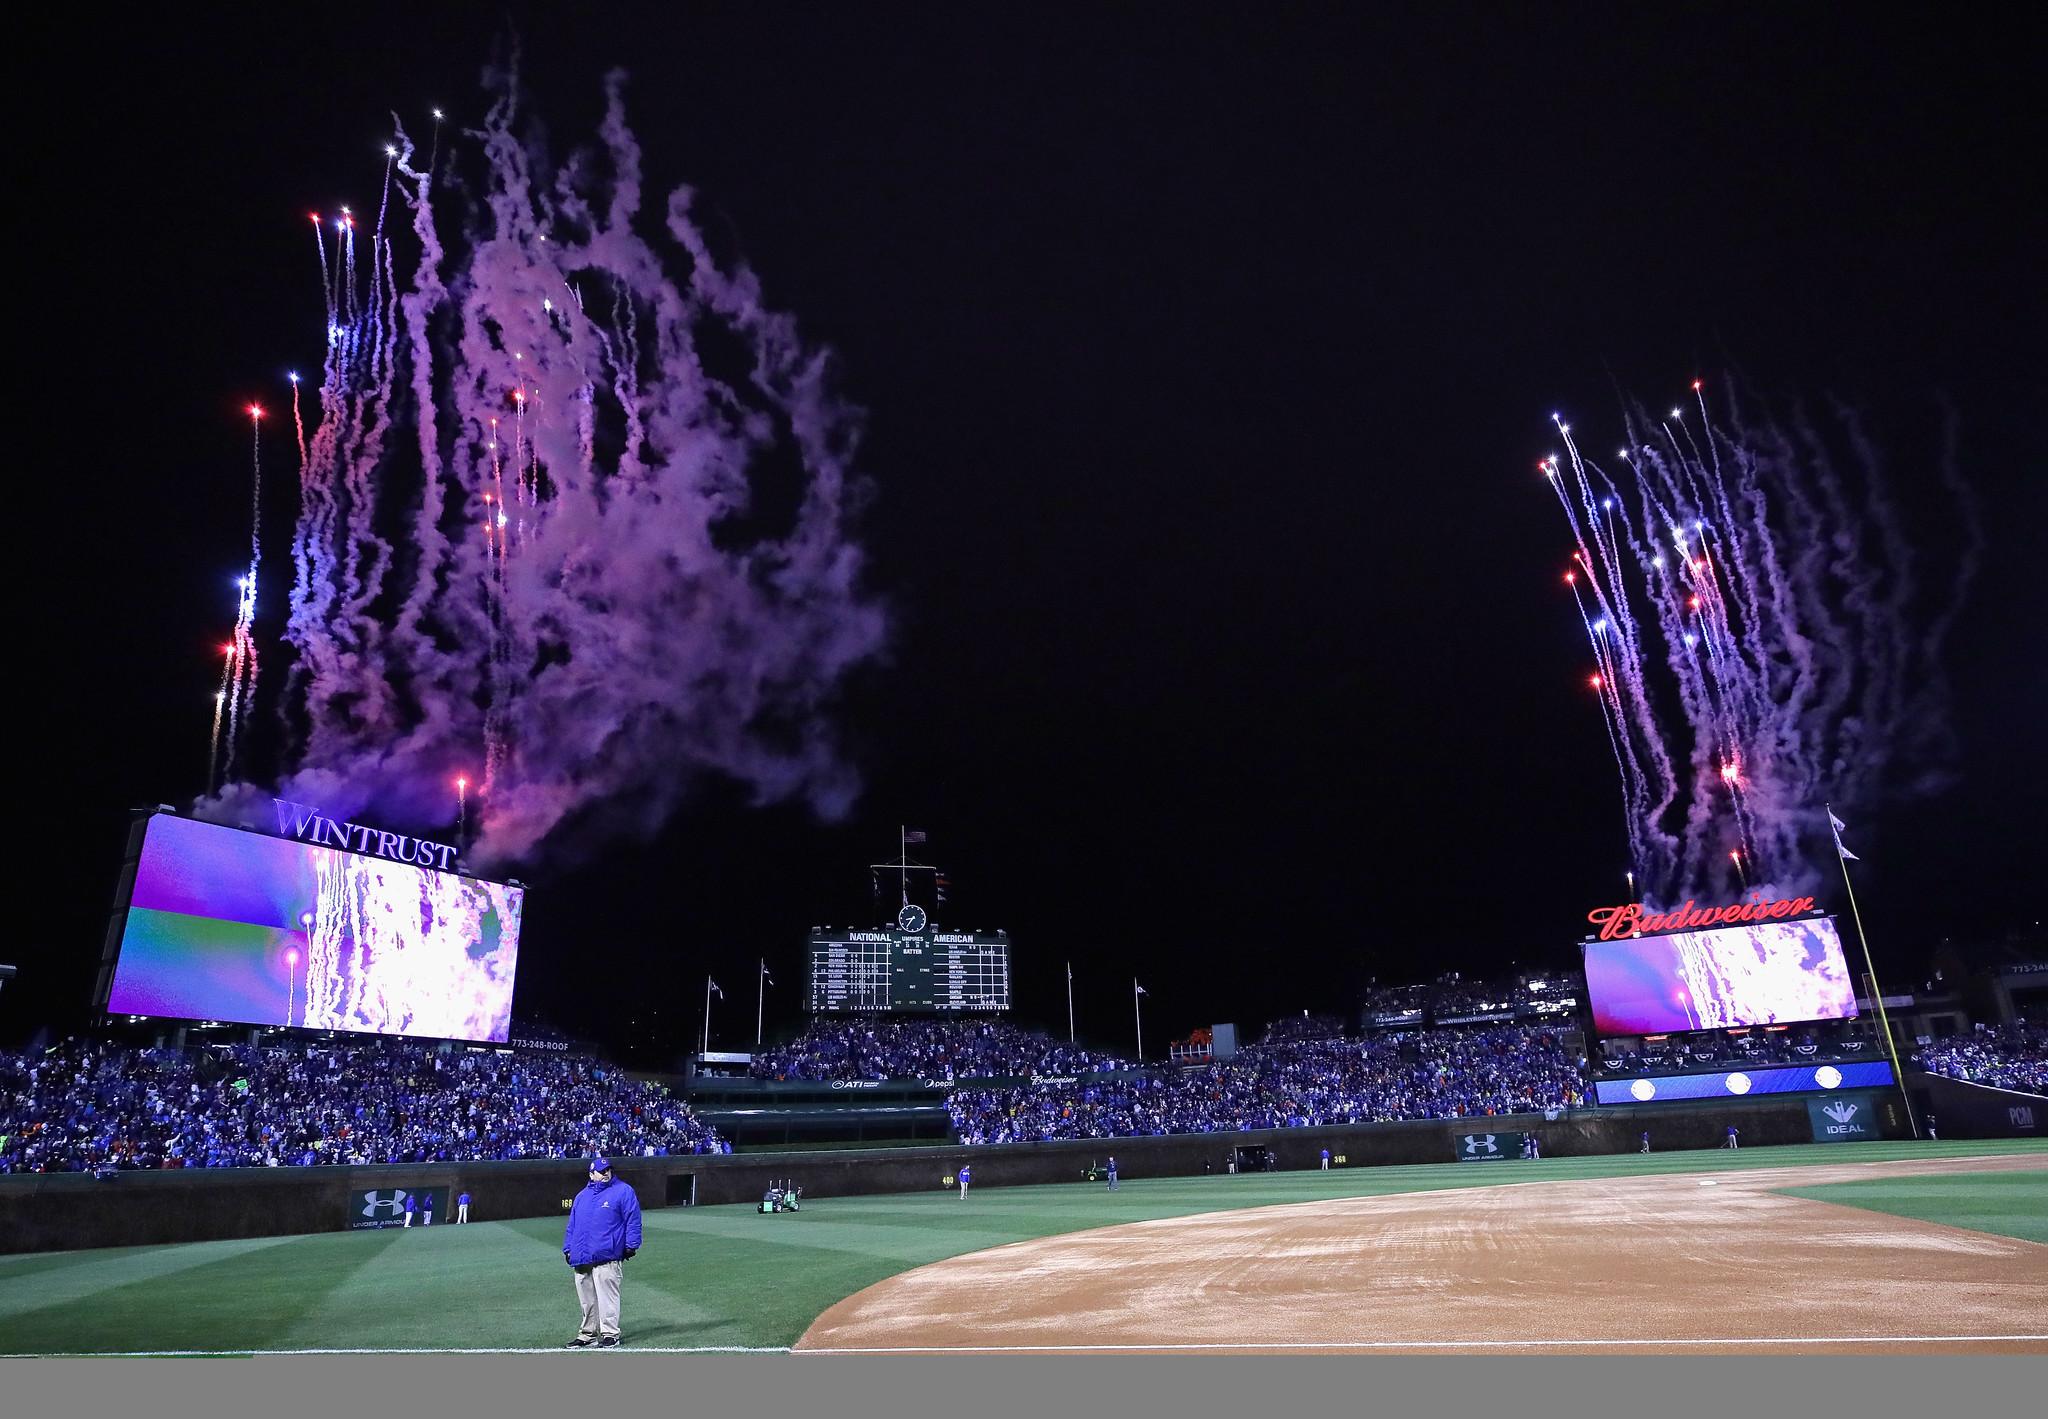 Rainy skies can't dampen Cubs fans' spirits - Chicago Tribune